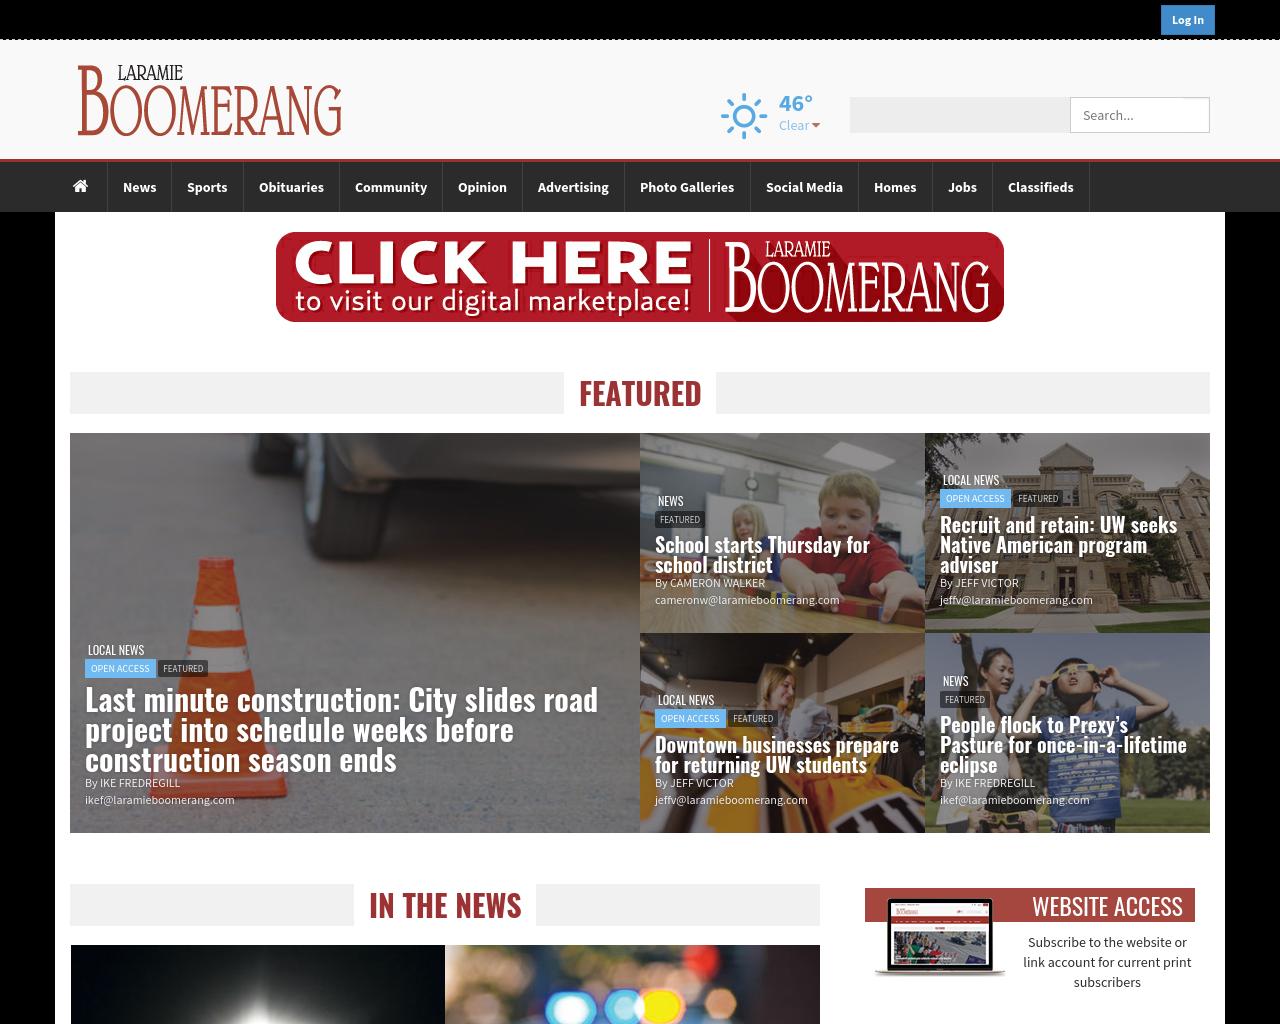 Laramie-Boomerang-Advertising-Reviews-Pricing